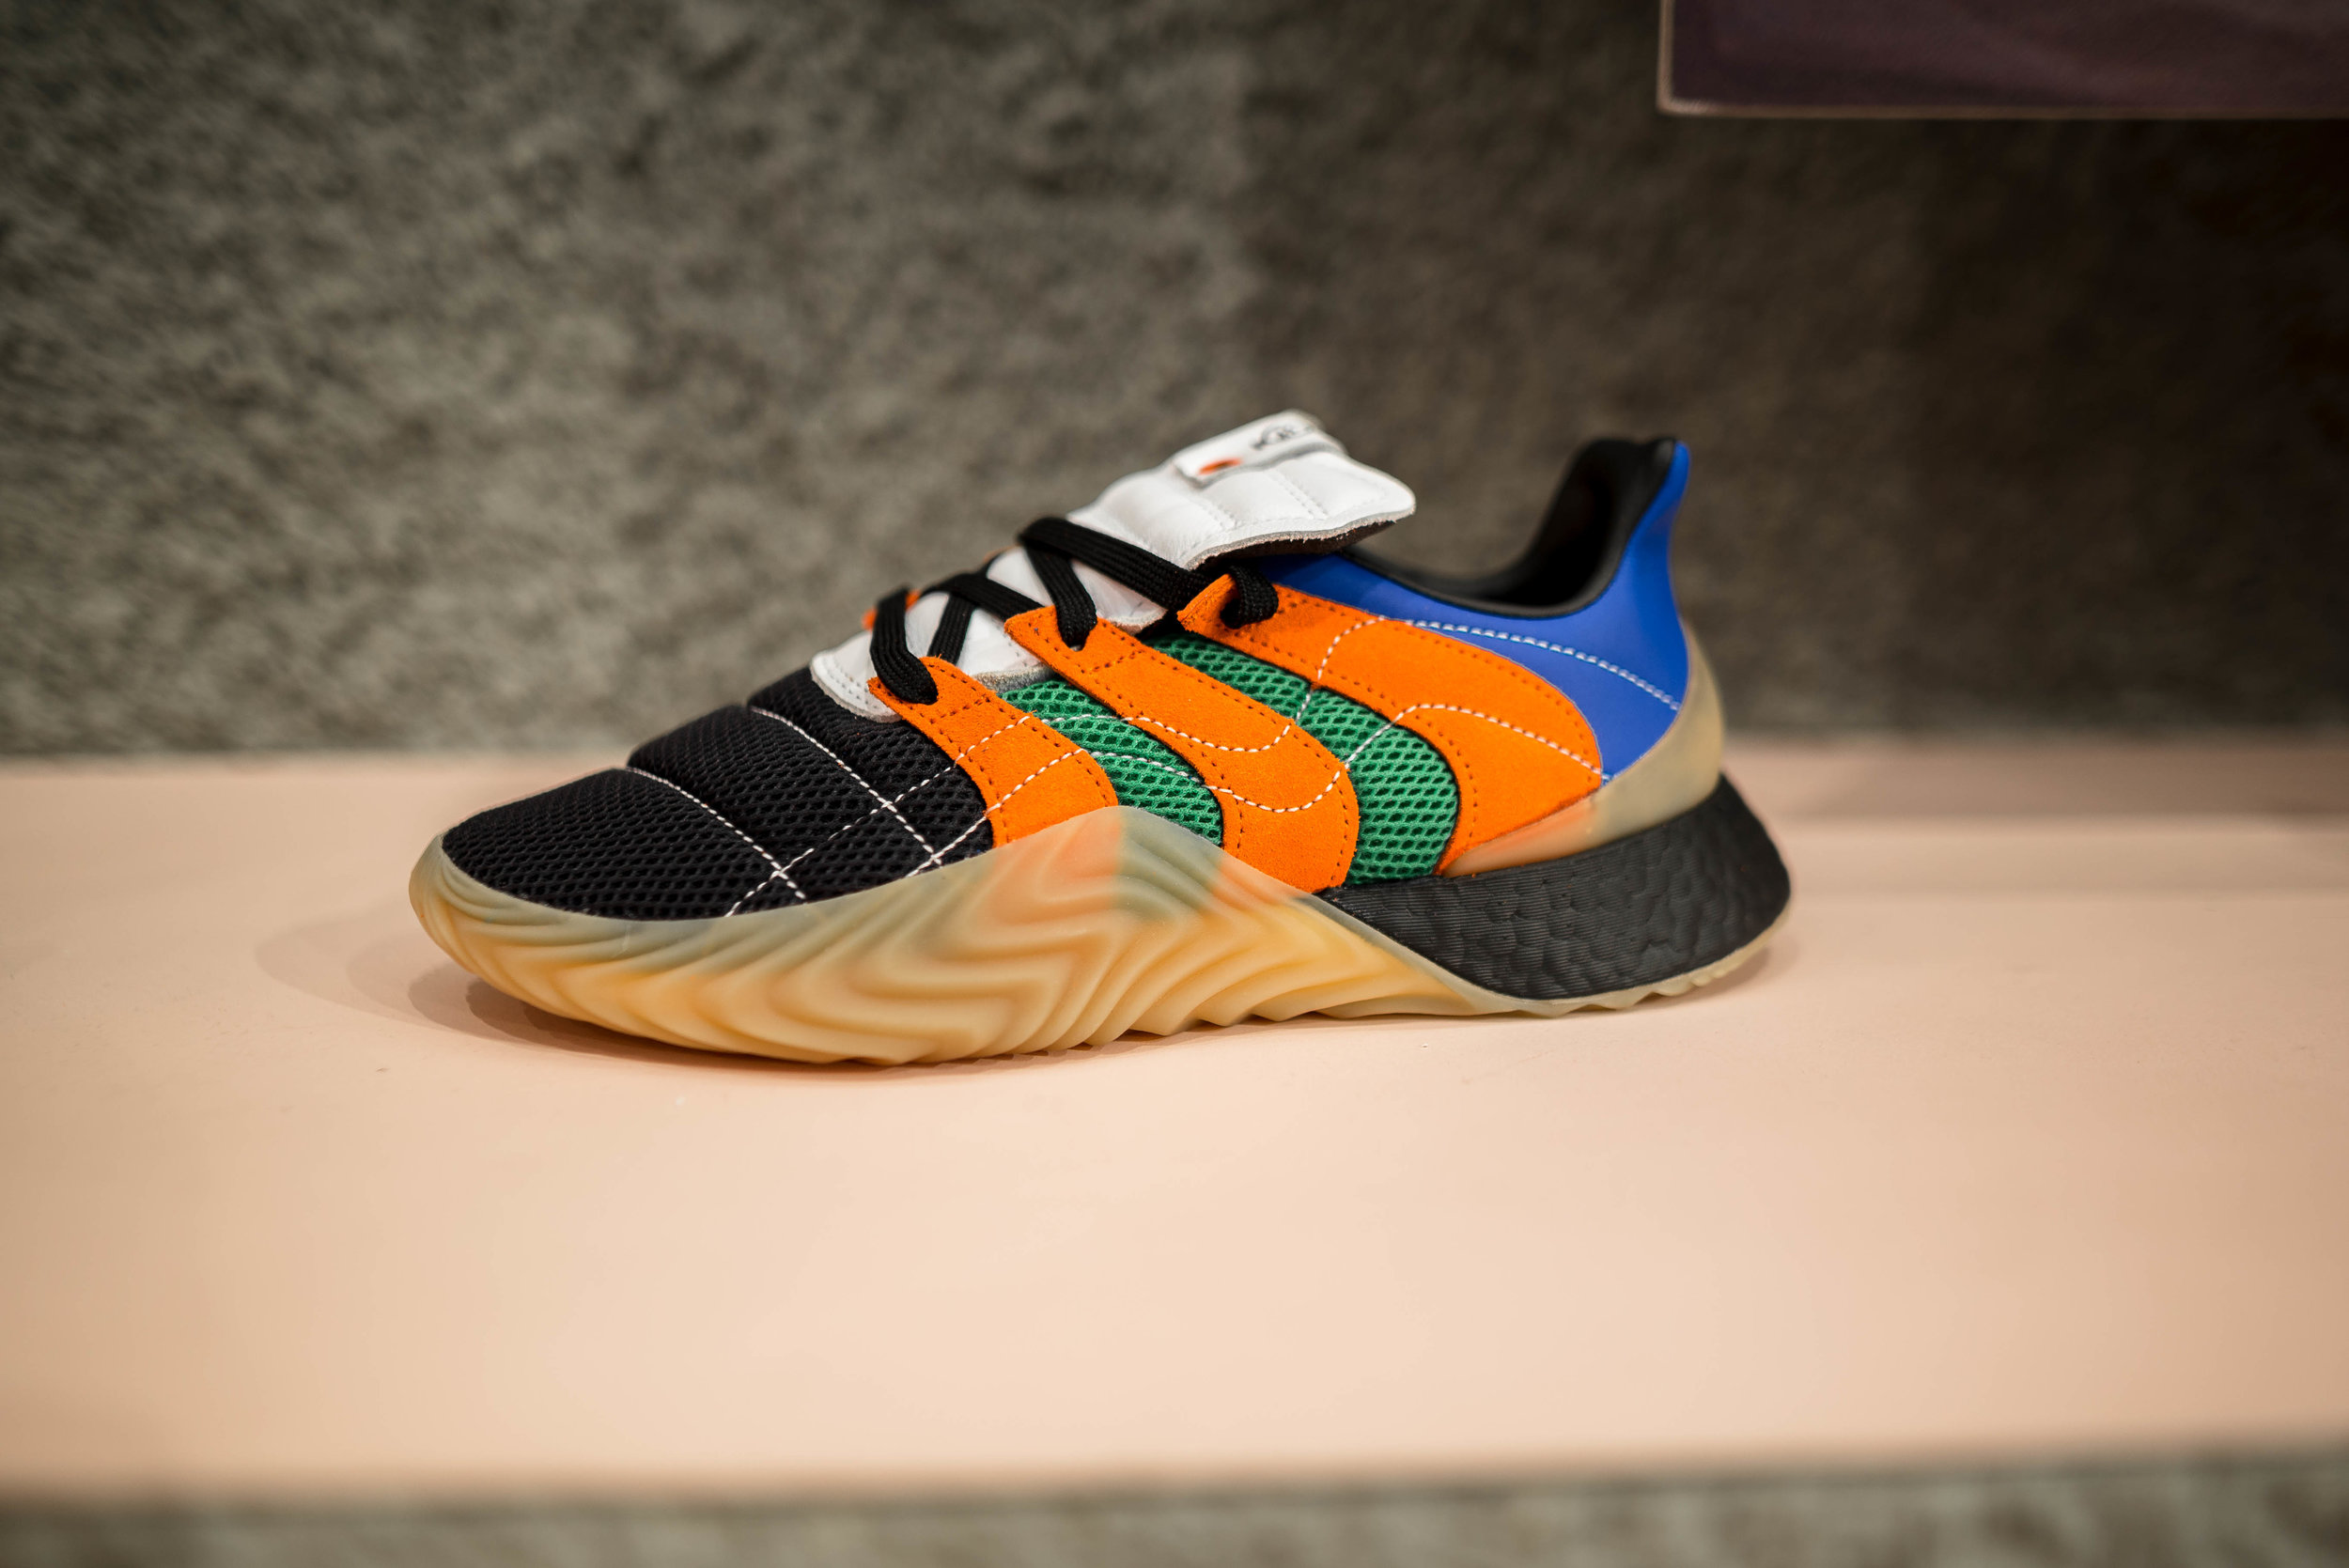 celos Admitir esculpir  Spanish retailer SVD celebrated their new collaboration with Adidas last  night — Epsilon Magazine